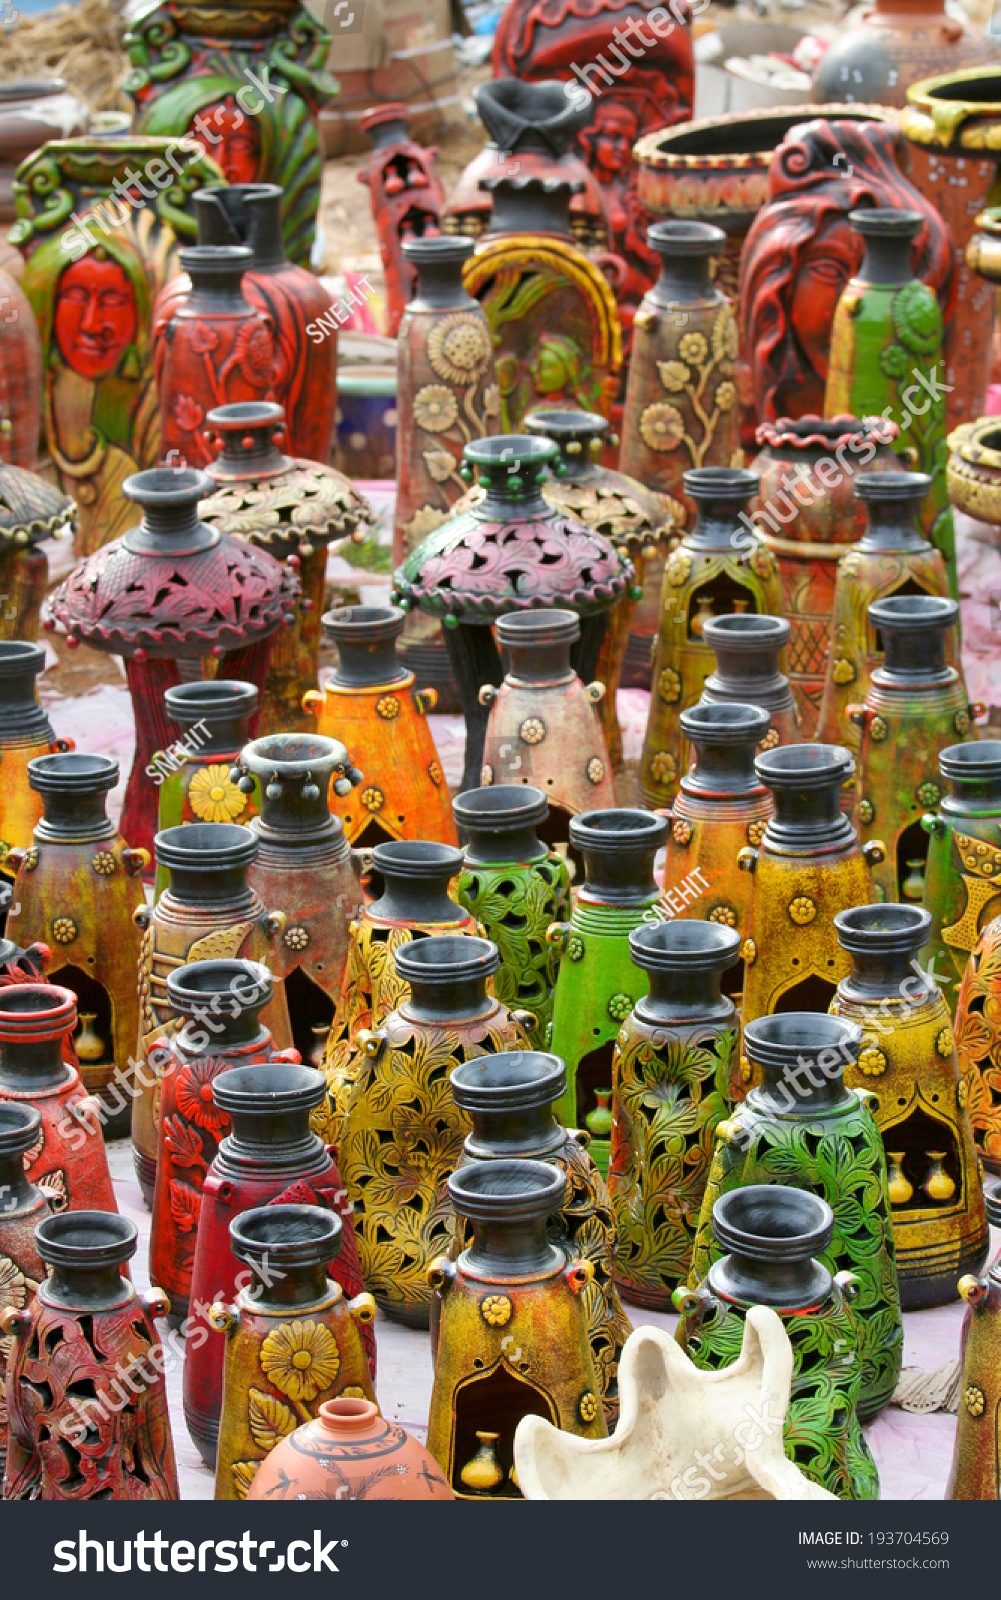 Colorful Pots Handicrafts India Stock Photo Edit Now 193704569